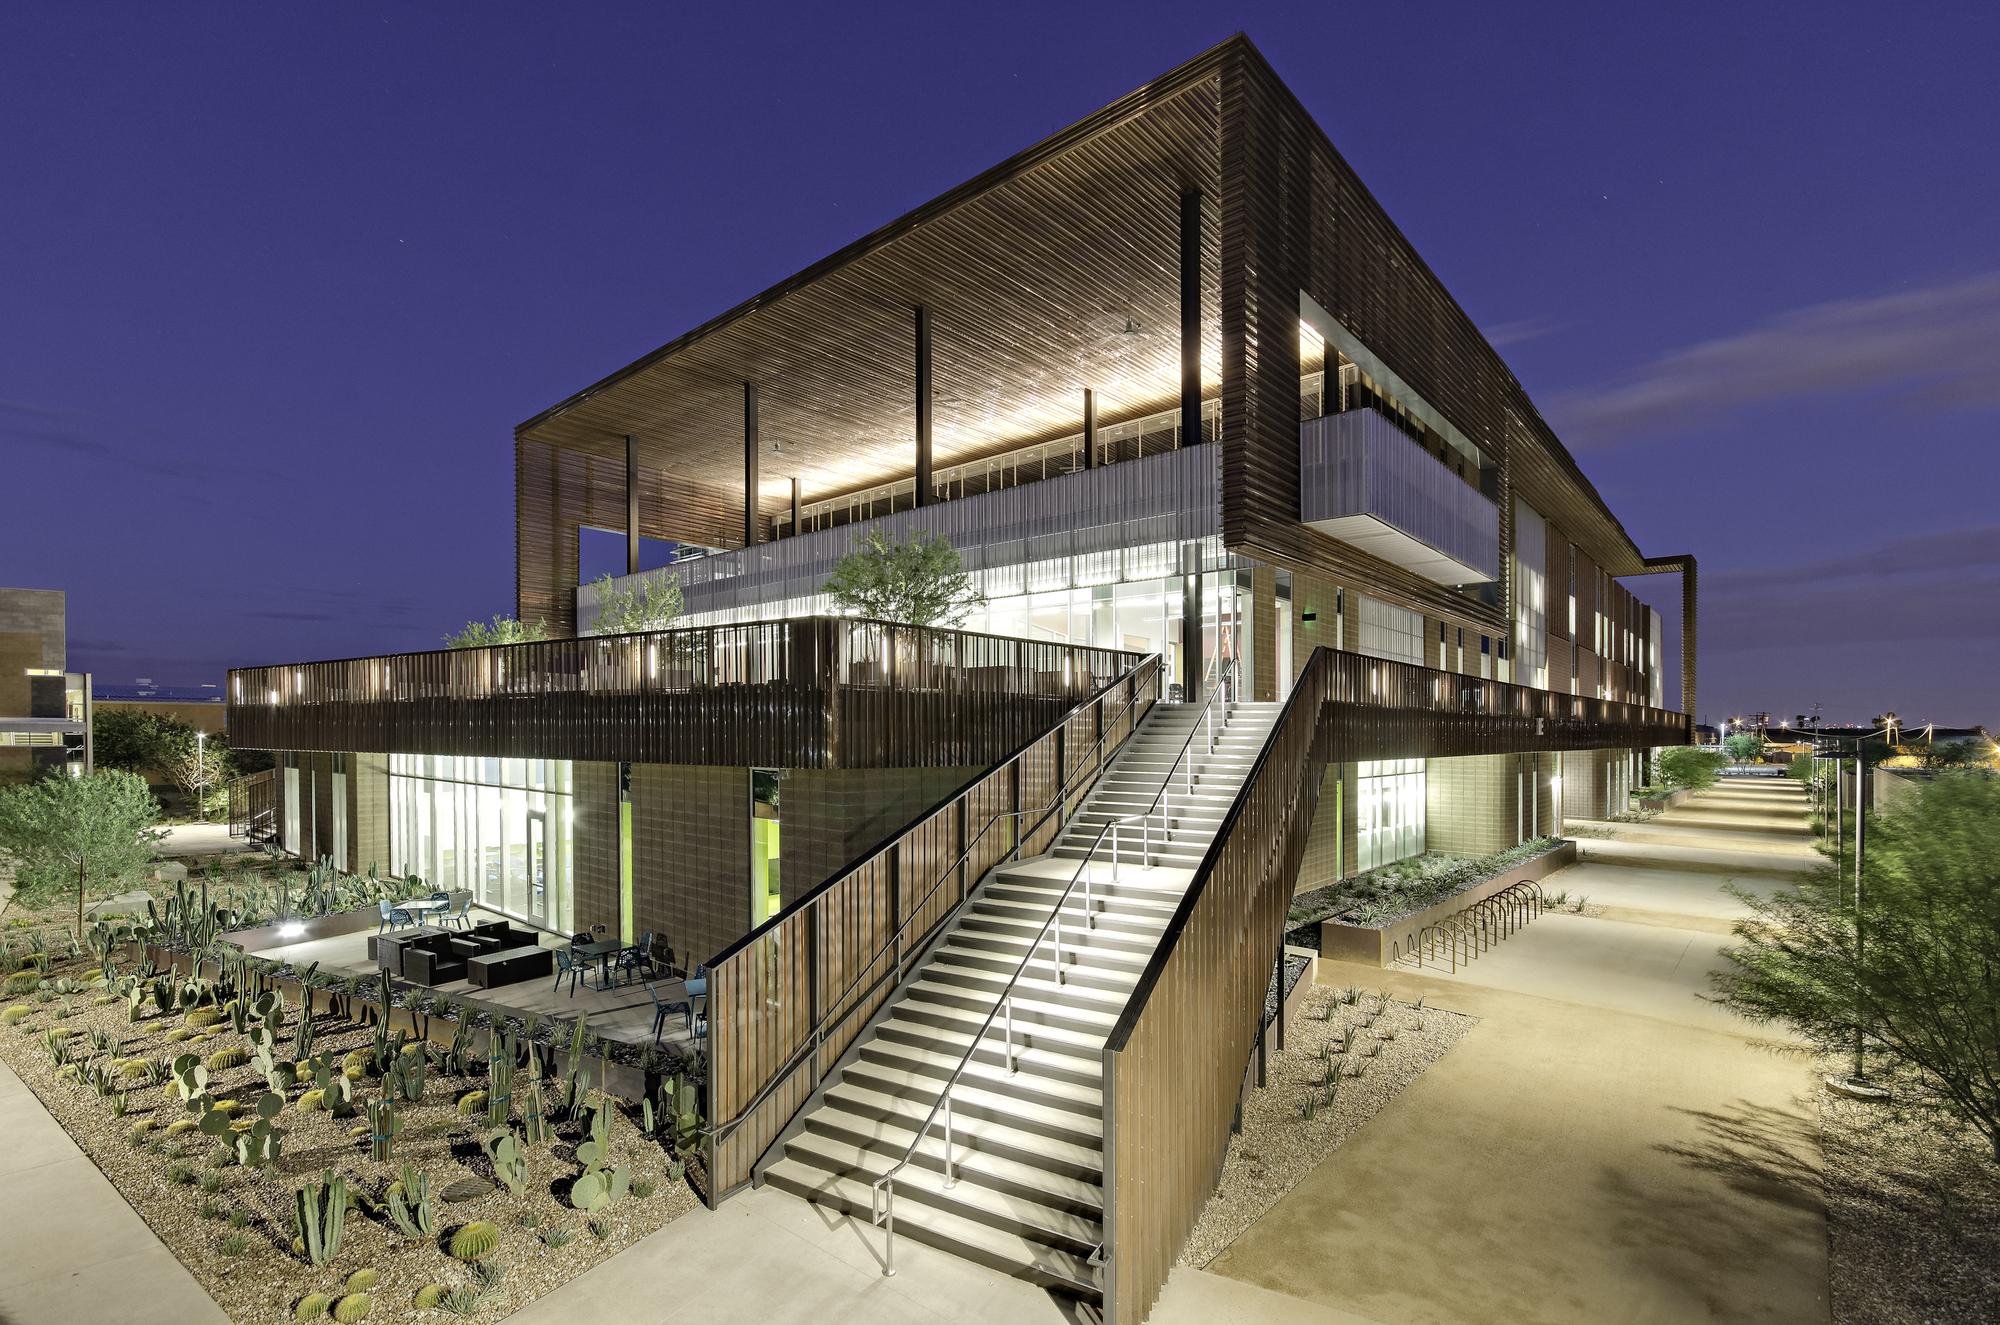 GateWay Community College / SmithGroup JJR